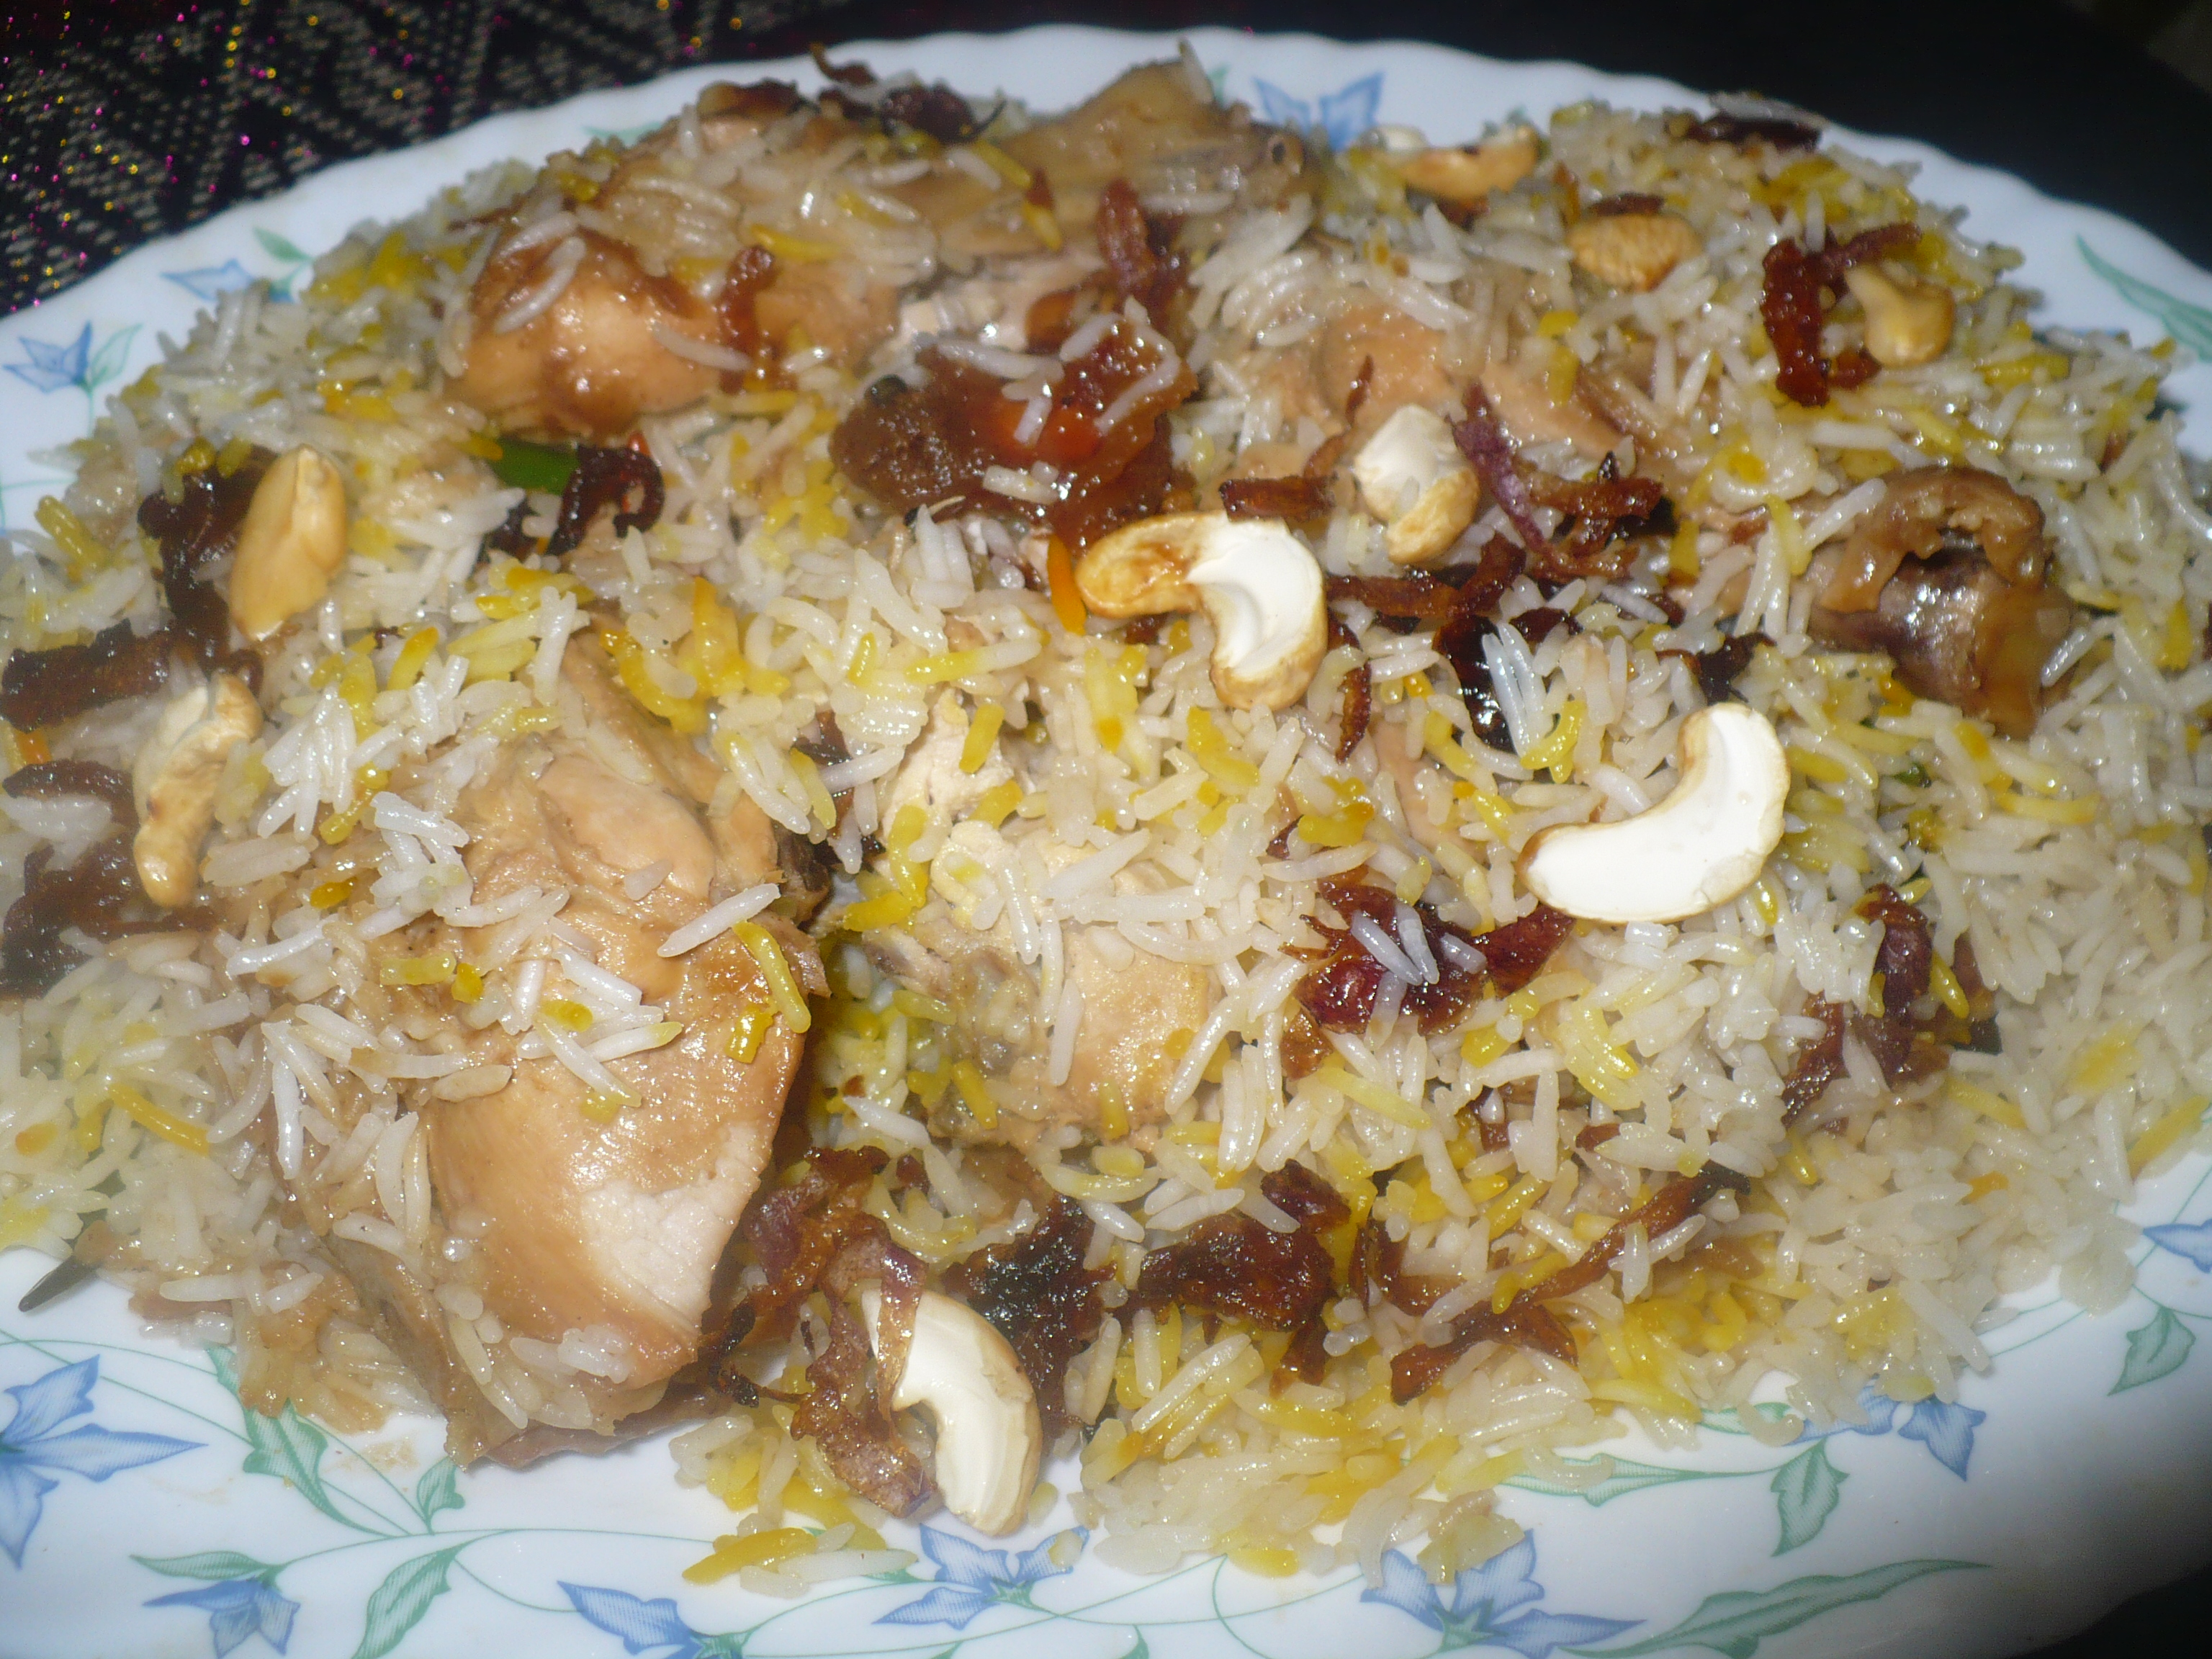 Biriyani recipe khadizas kitchen 016 forumfinder Choice Image